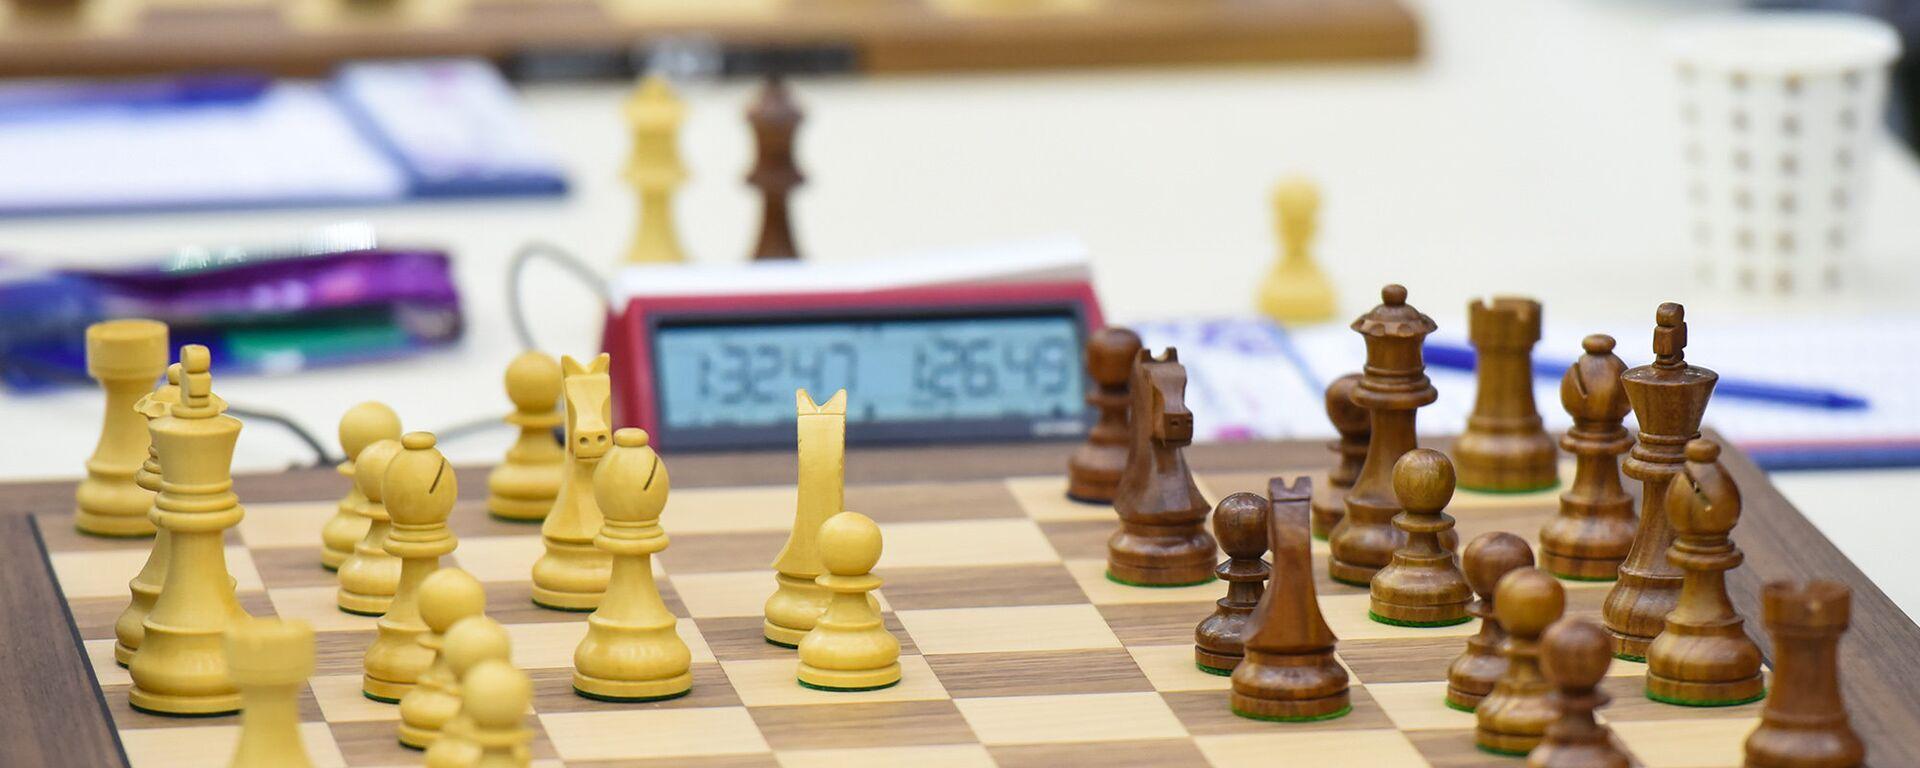 Шахматная доска - Sputnik Азербайджан, 1920, 03.05.2021